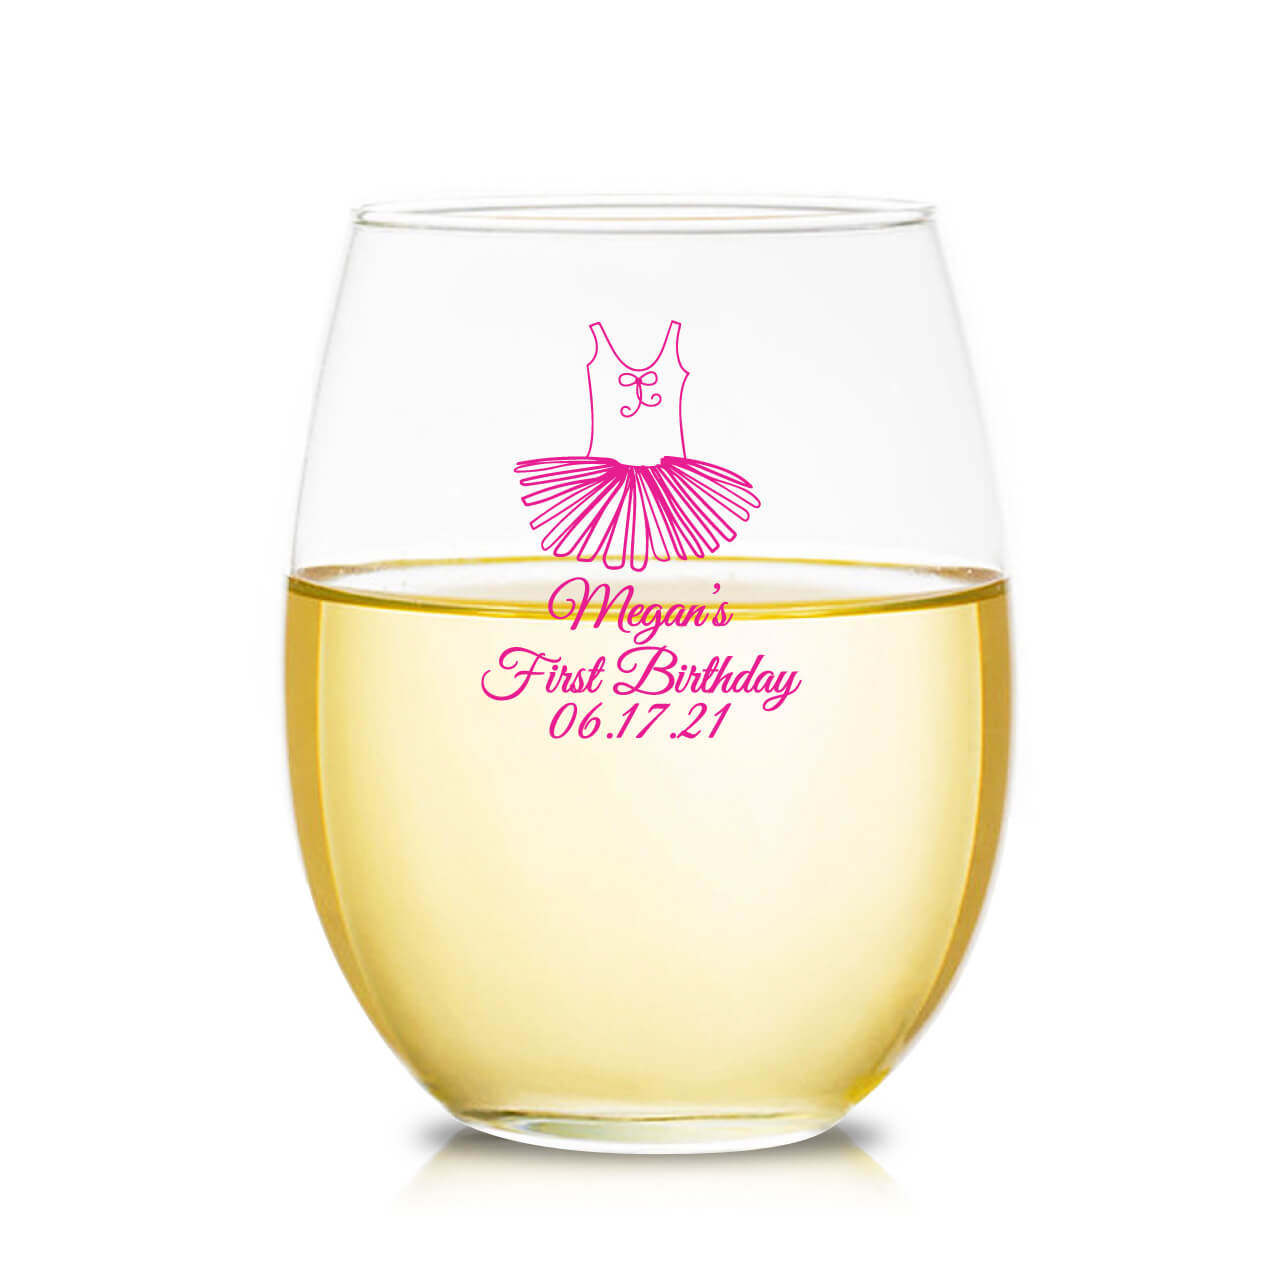 82a6b424702e Personalized 9 oz. Stemless Wine Glass - Tutu - Favors & Flowers